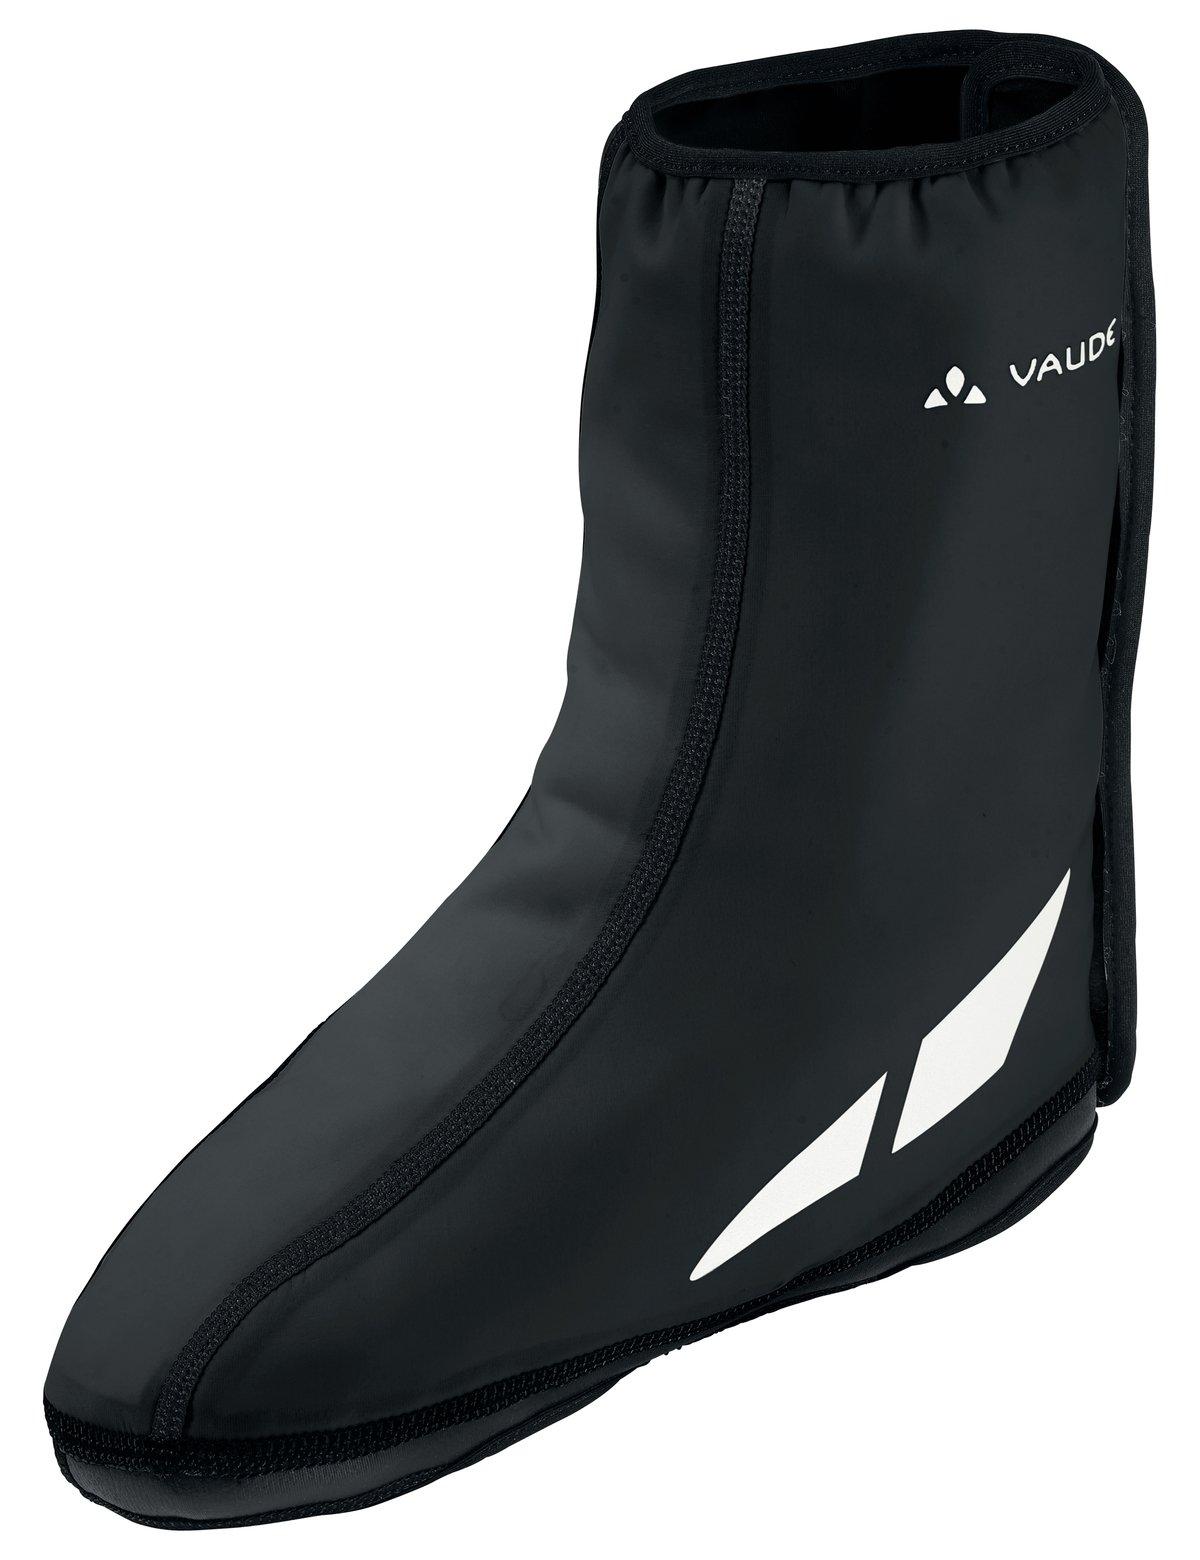 Vaude Wet Light III skoovertræk sort   Shoe Covers